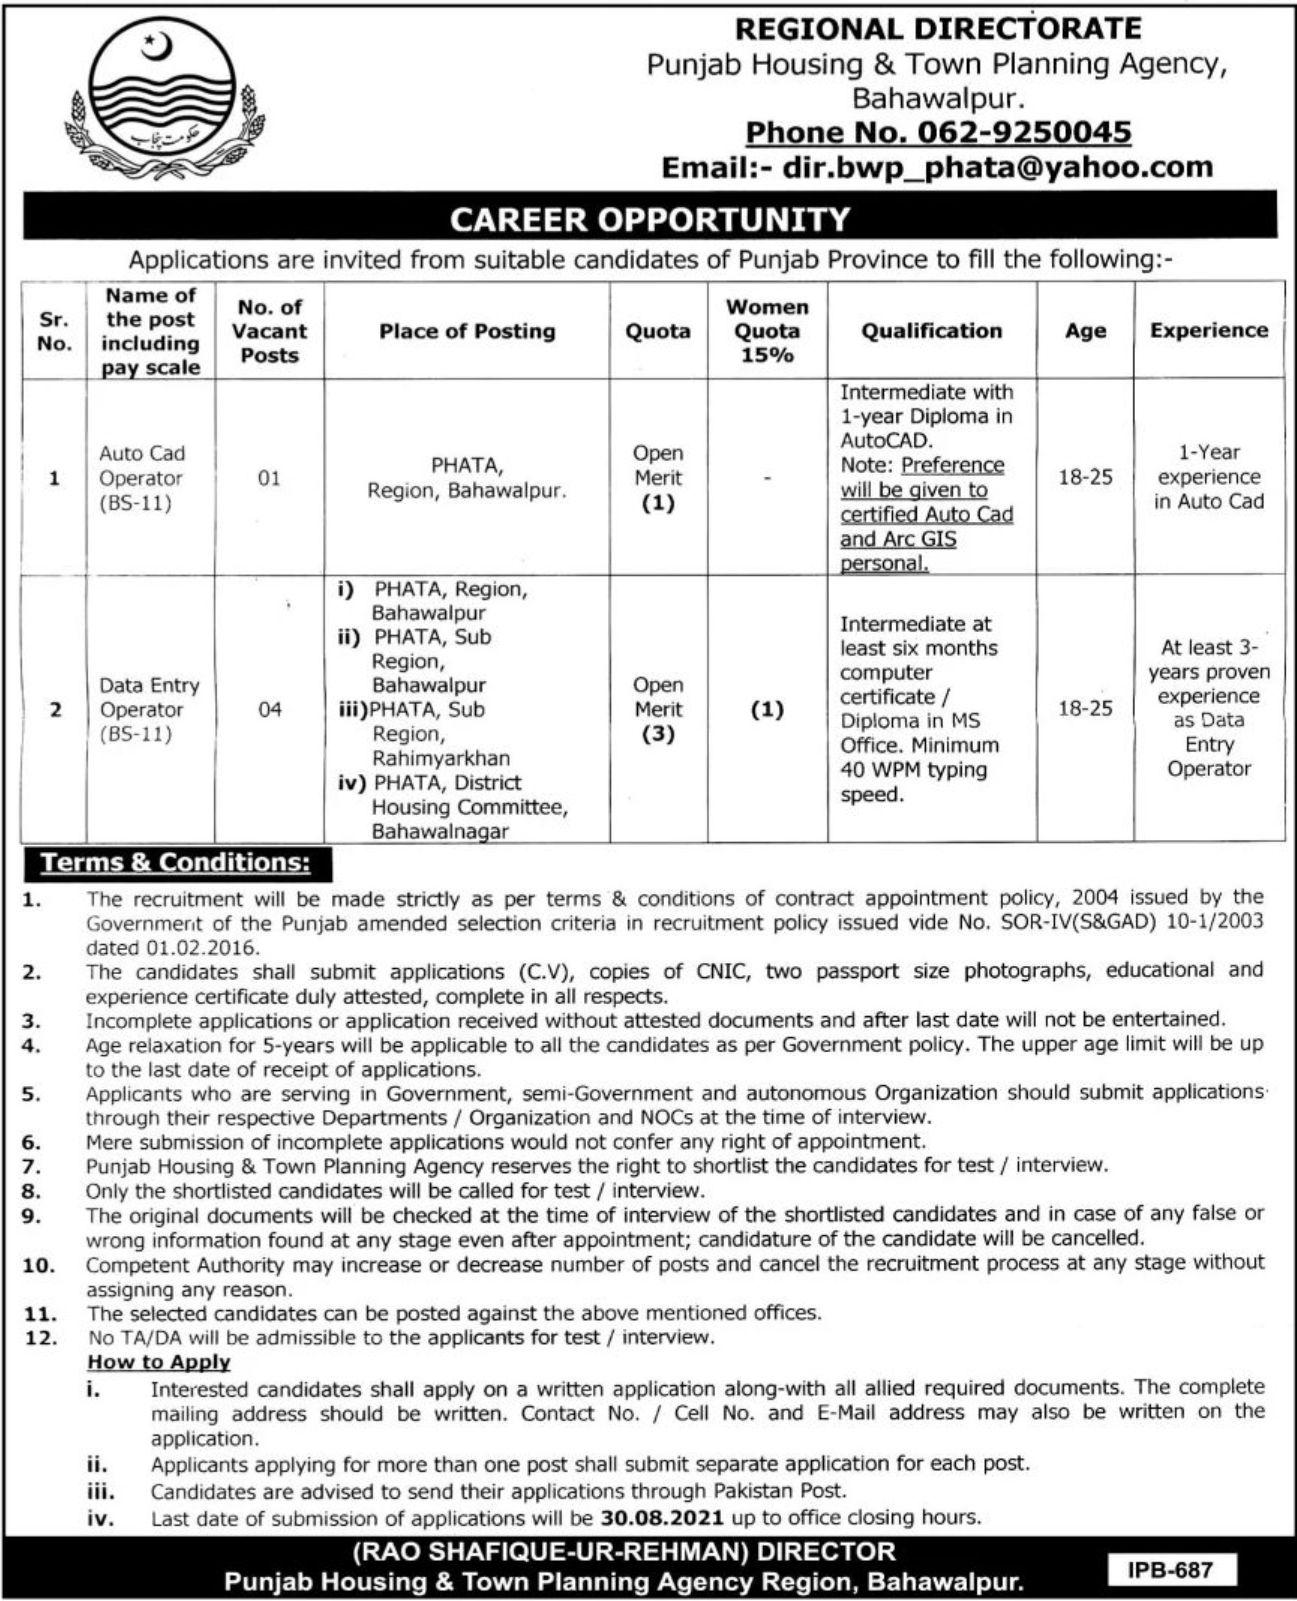 Punjab Housing & Town Planning Agency Bahawalpur Vacancies 2021 3